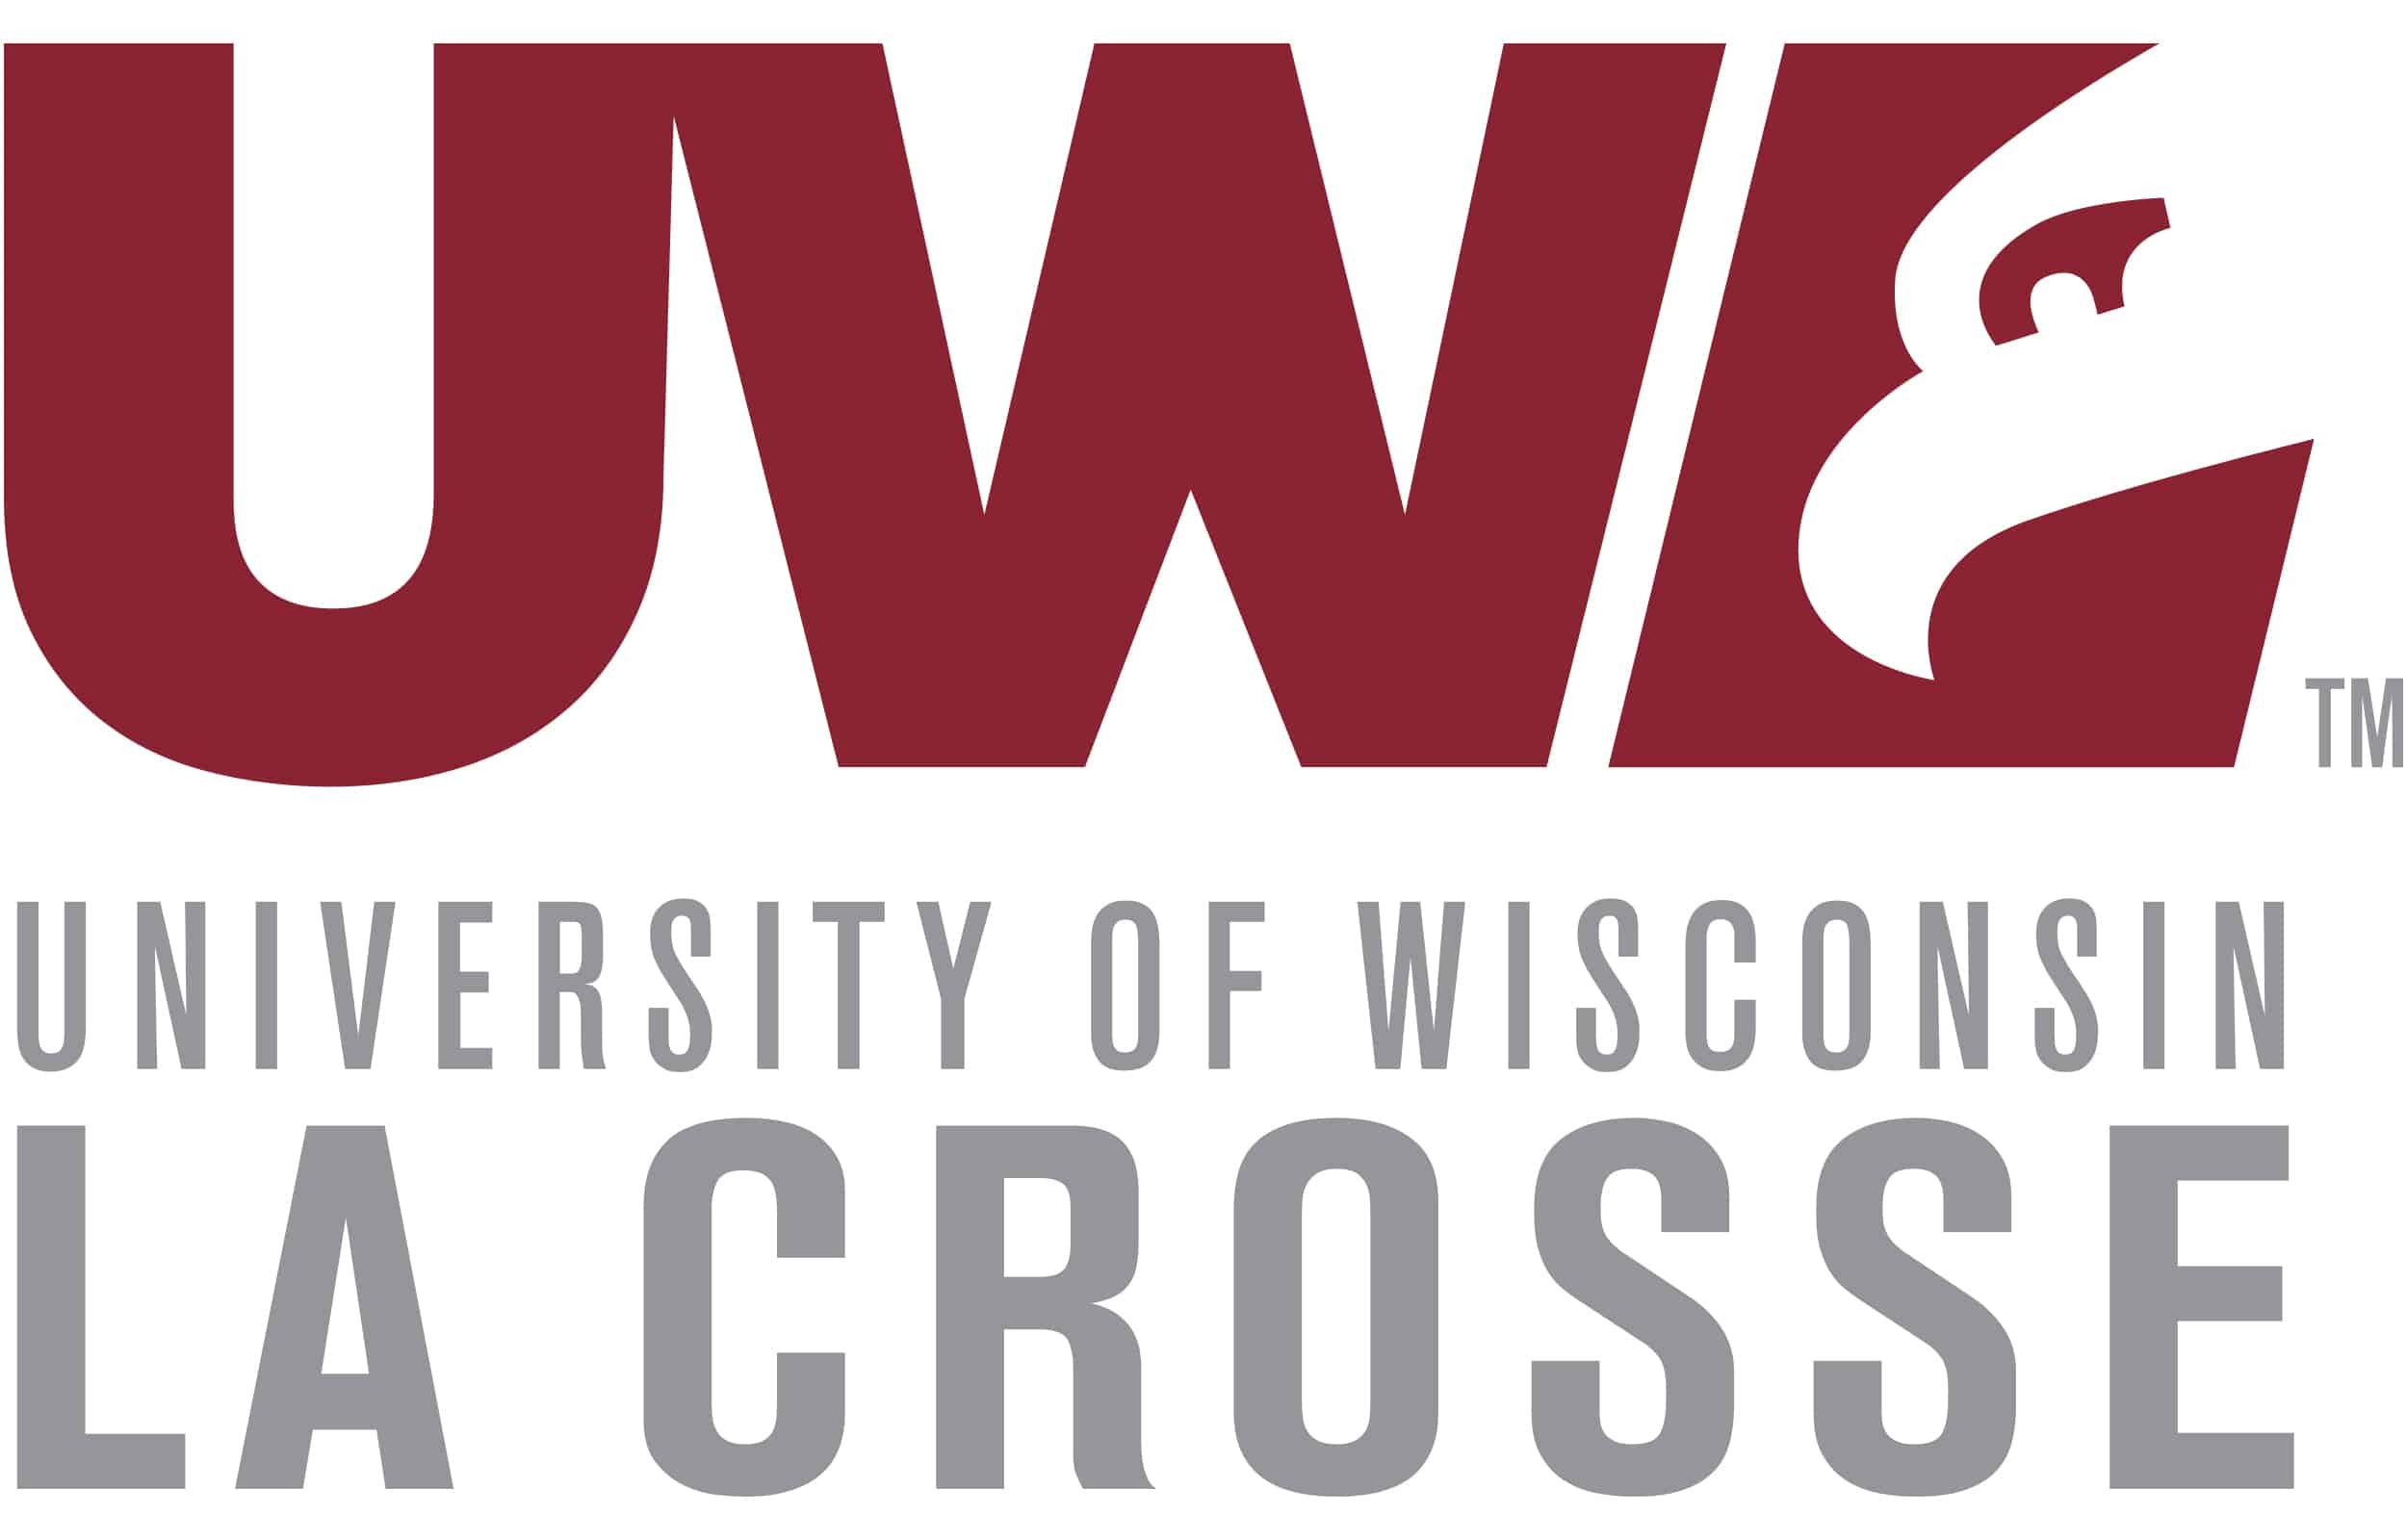 University of Wisconsin La Crosse logo